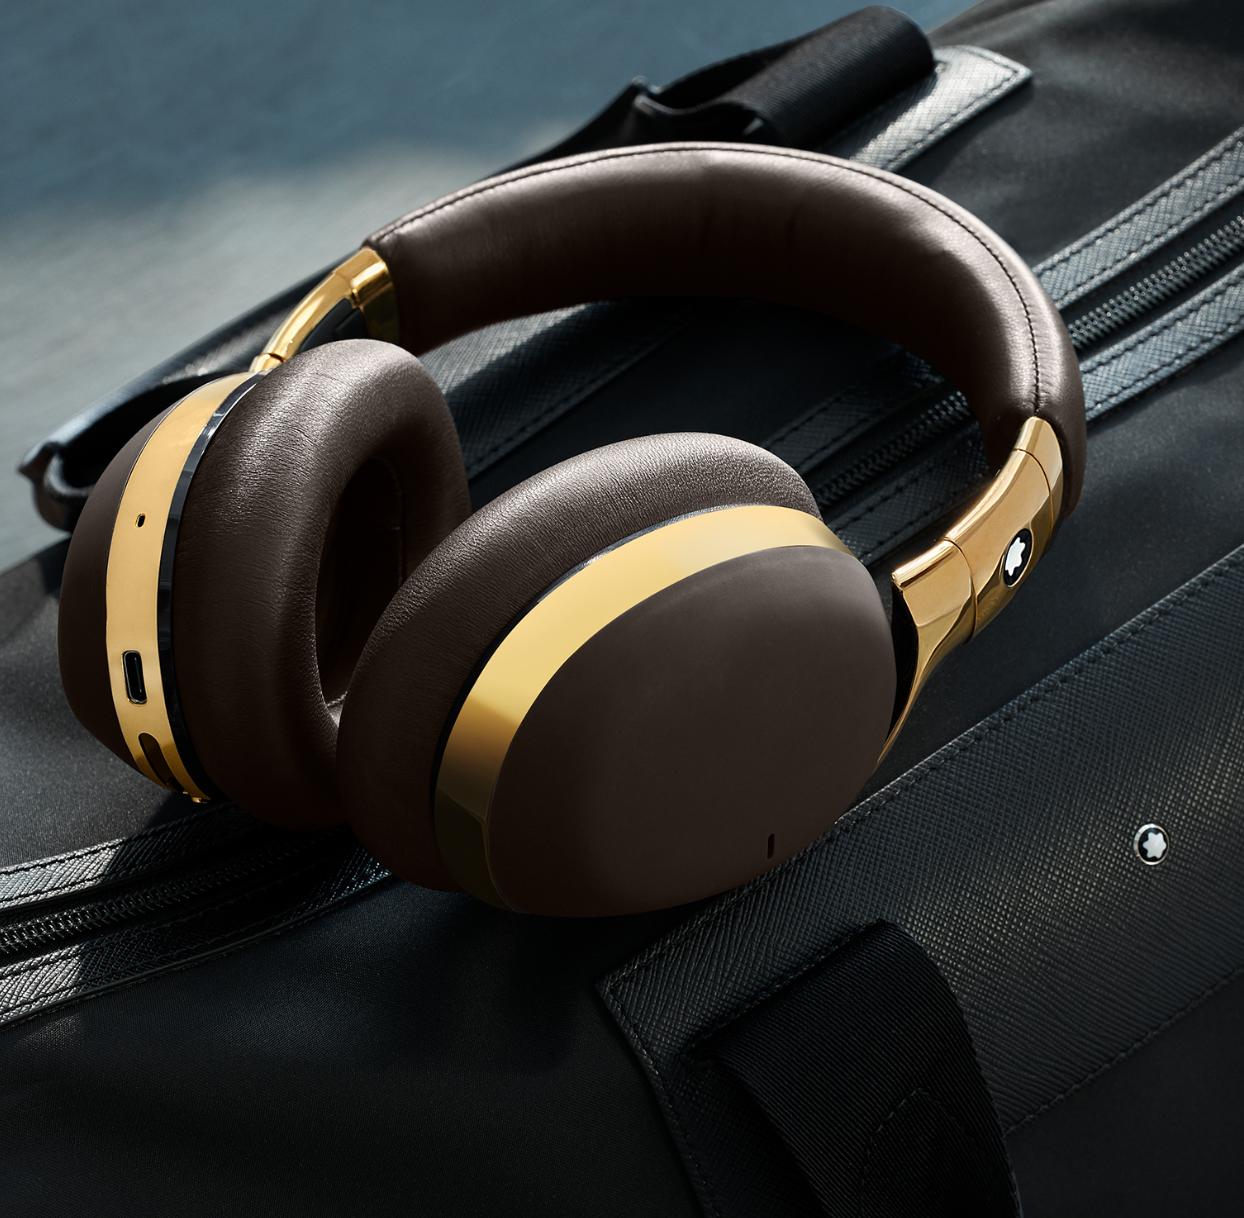 nuevos audífonos inalámbricos de Montblanc